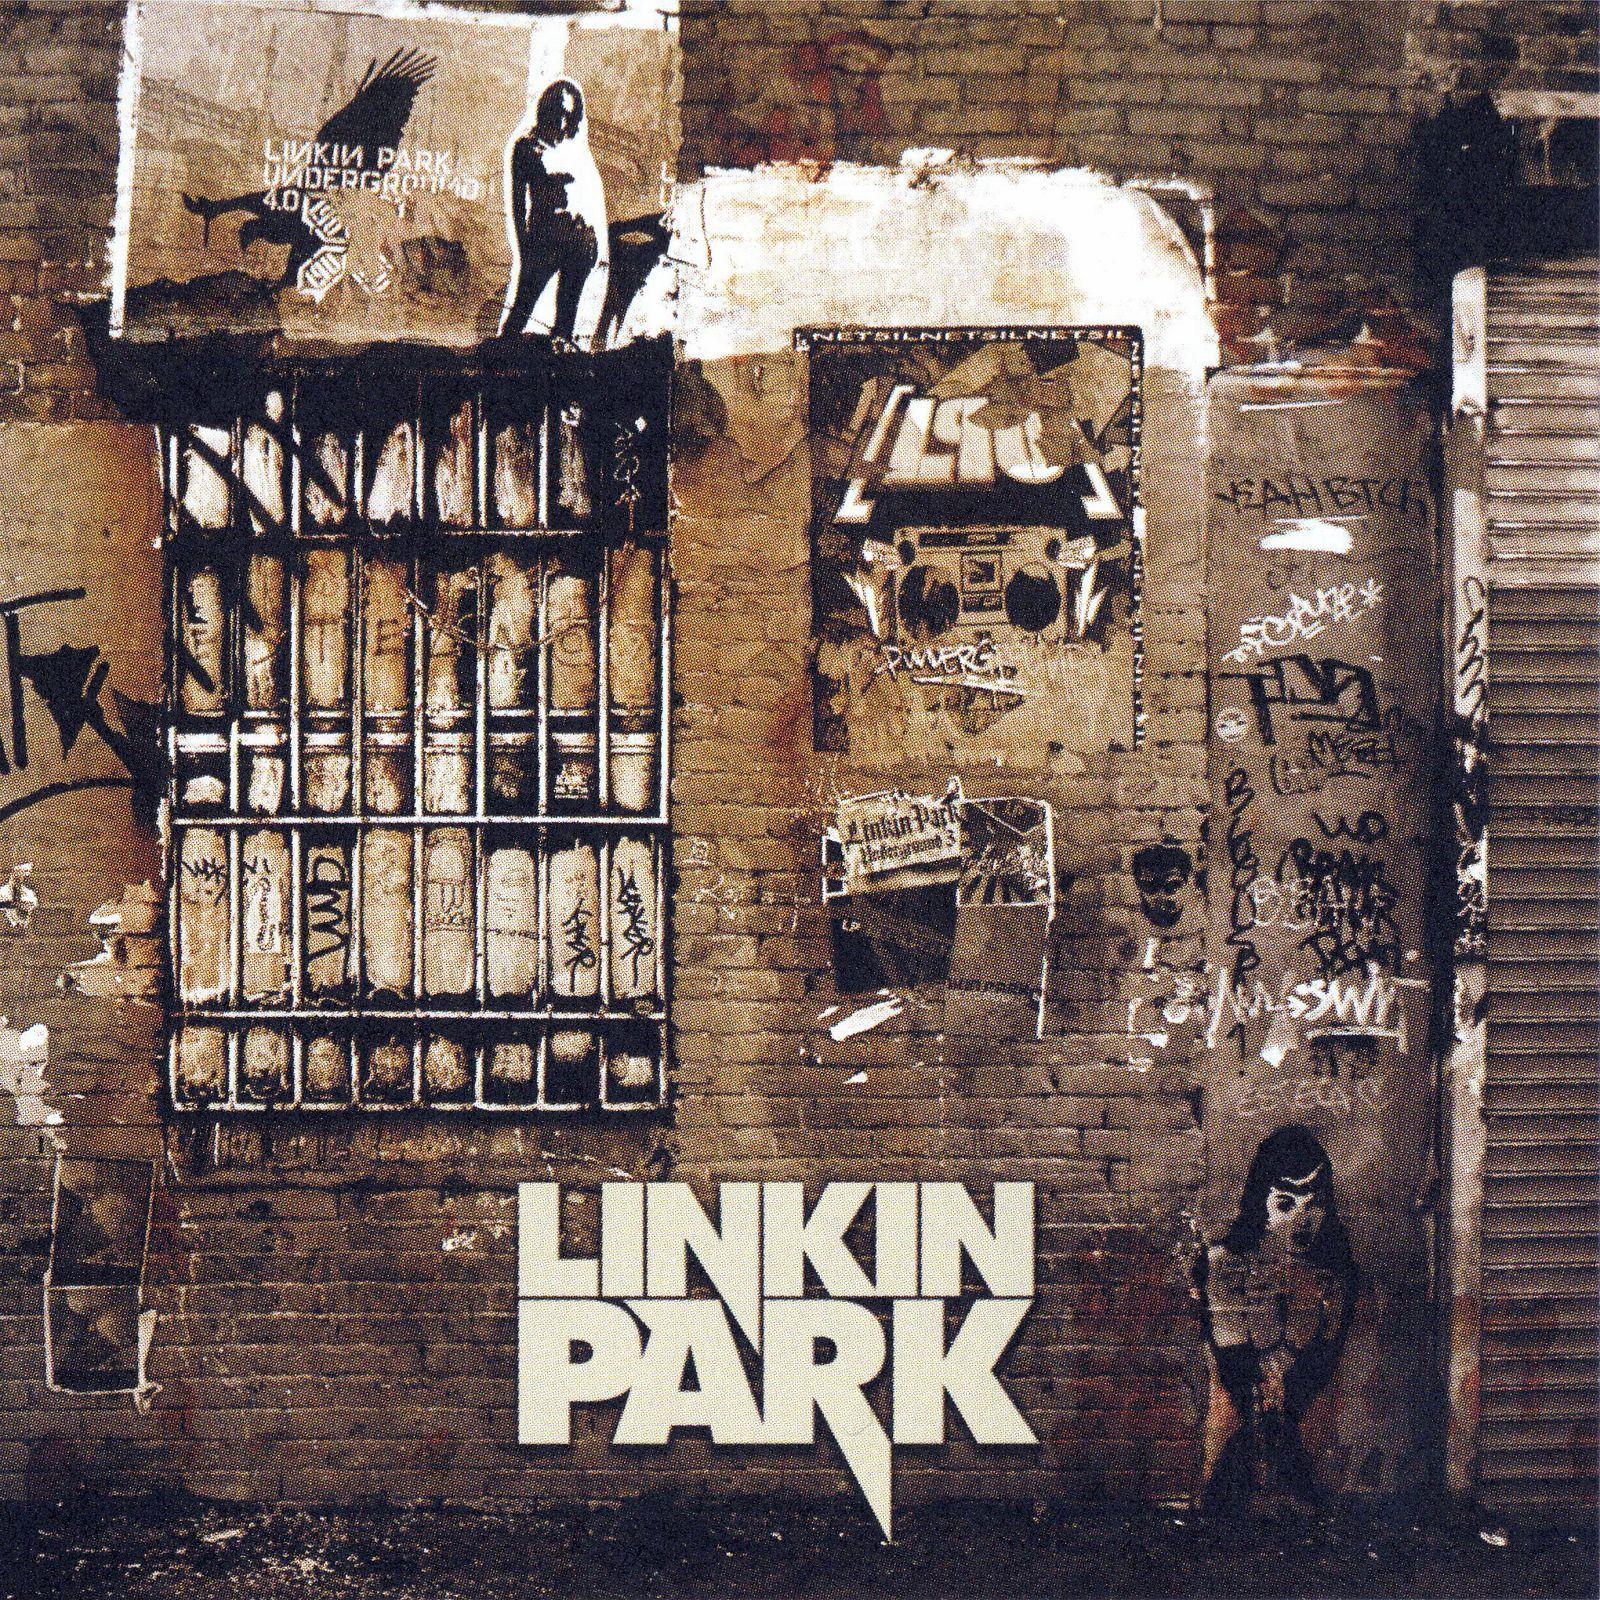 Image Result For Linkin Park Underground